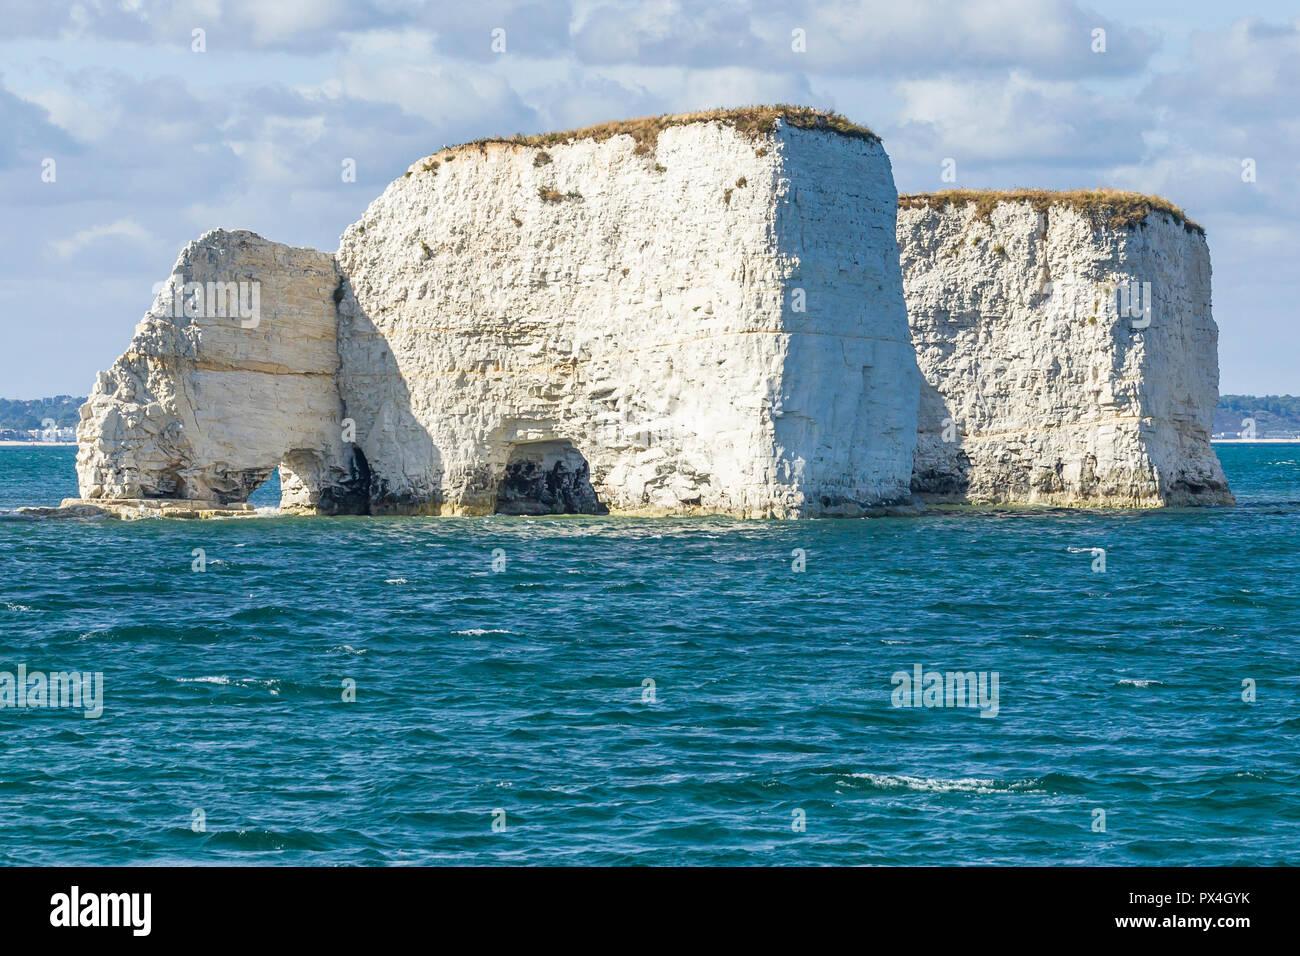 Old Harry chalk cliffs on Jurassic coast, Dorset. Stock Photo